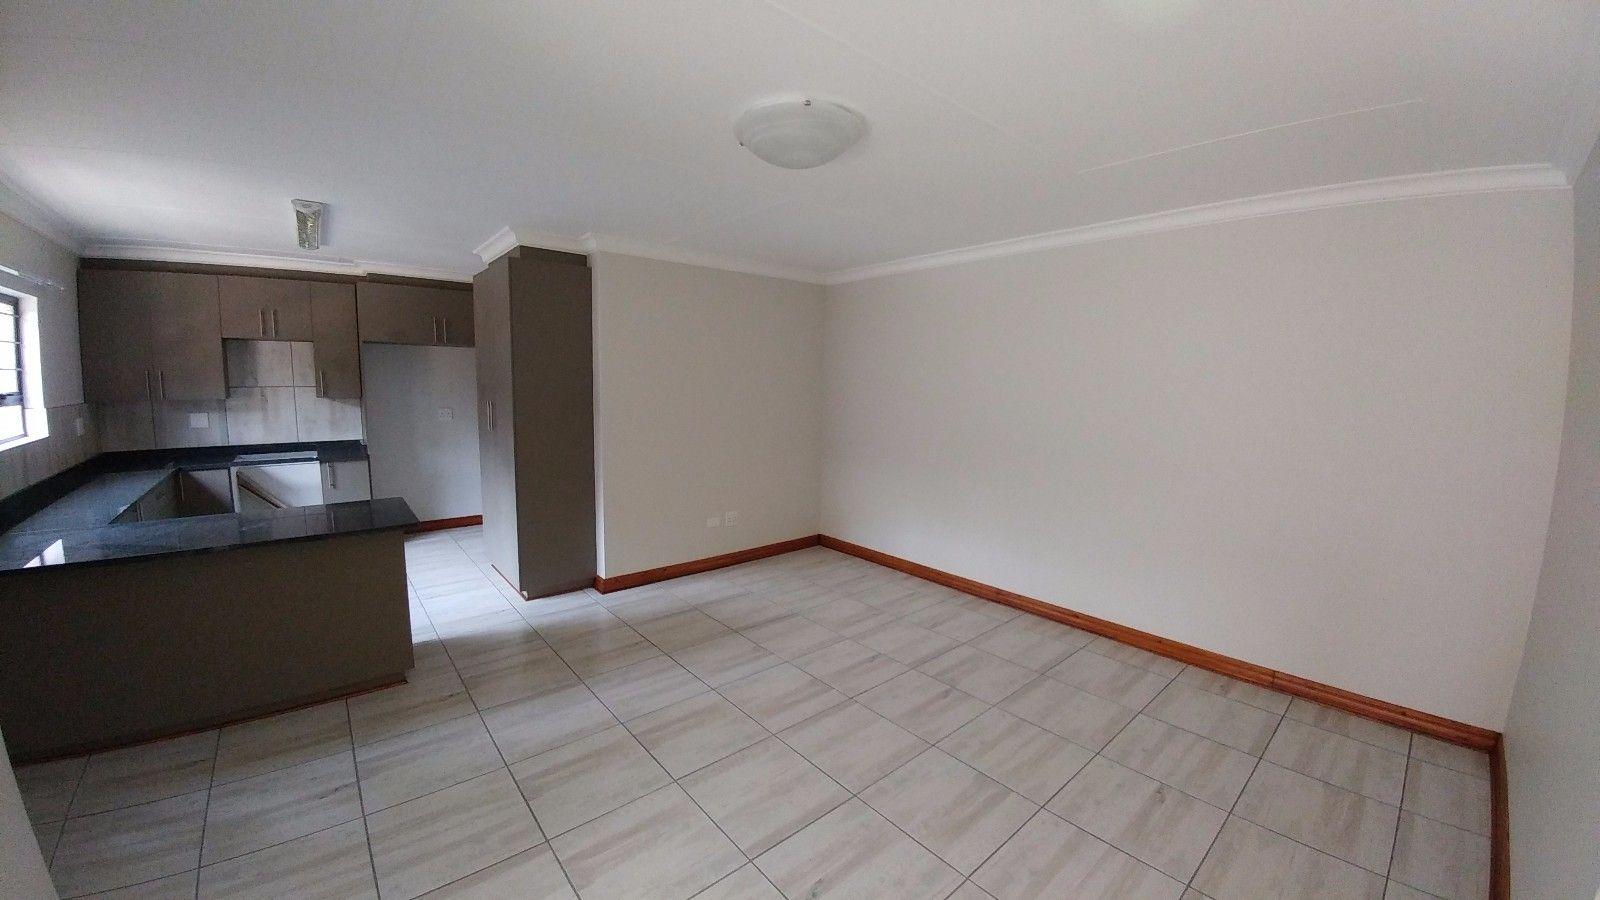 Baillie Park property for sale. Ref No: 13453104. Picture no 3